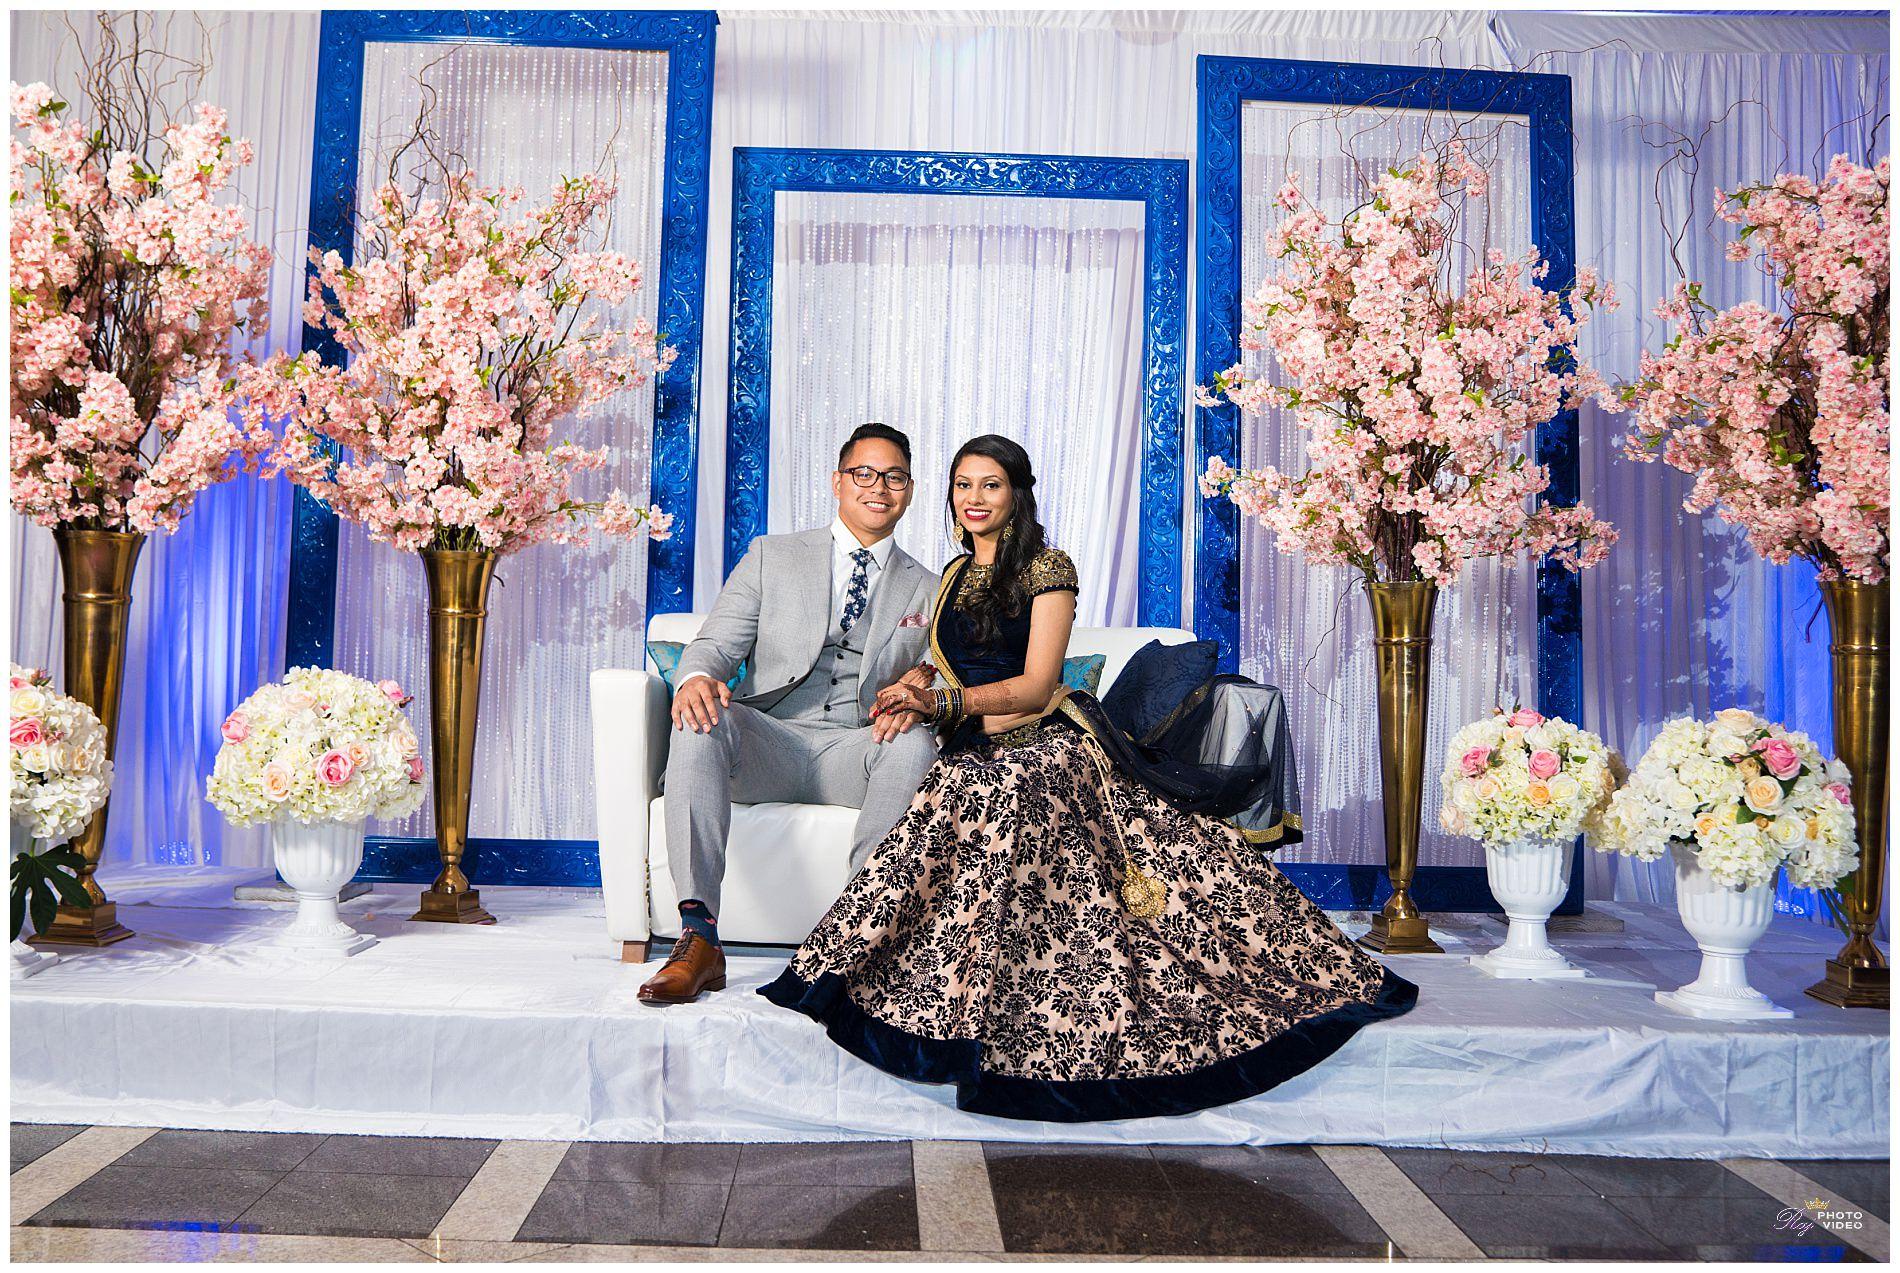 Royal-Manor-Garfield-NJ-Christian-Wedding-Ceremony-Khusbu-Jeff-56.jpg